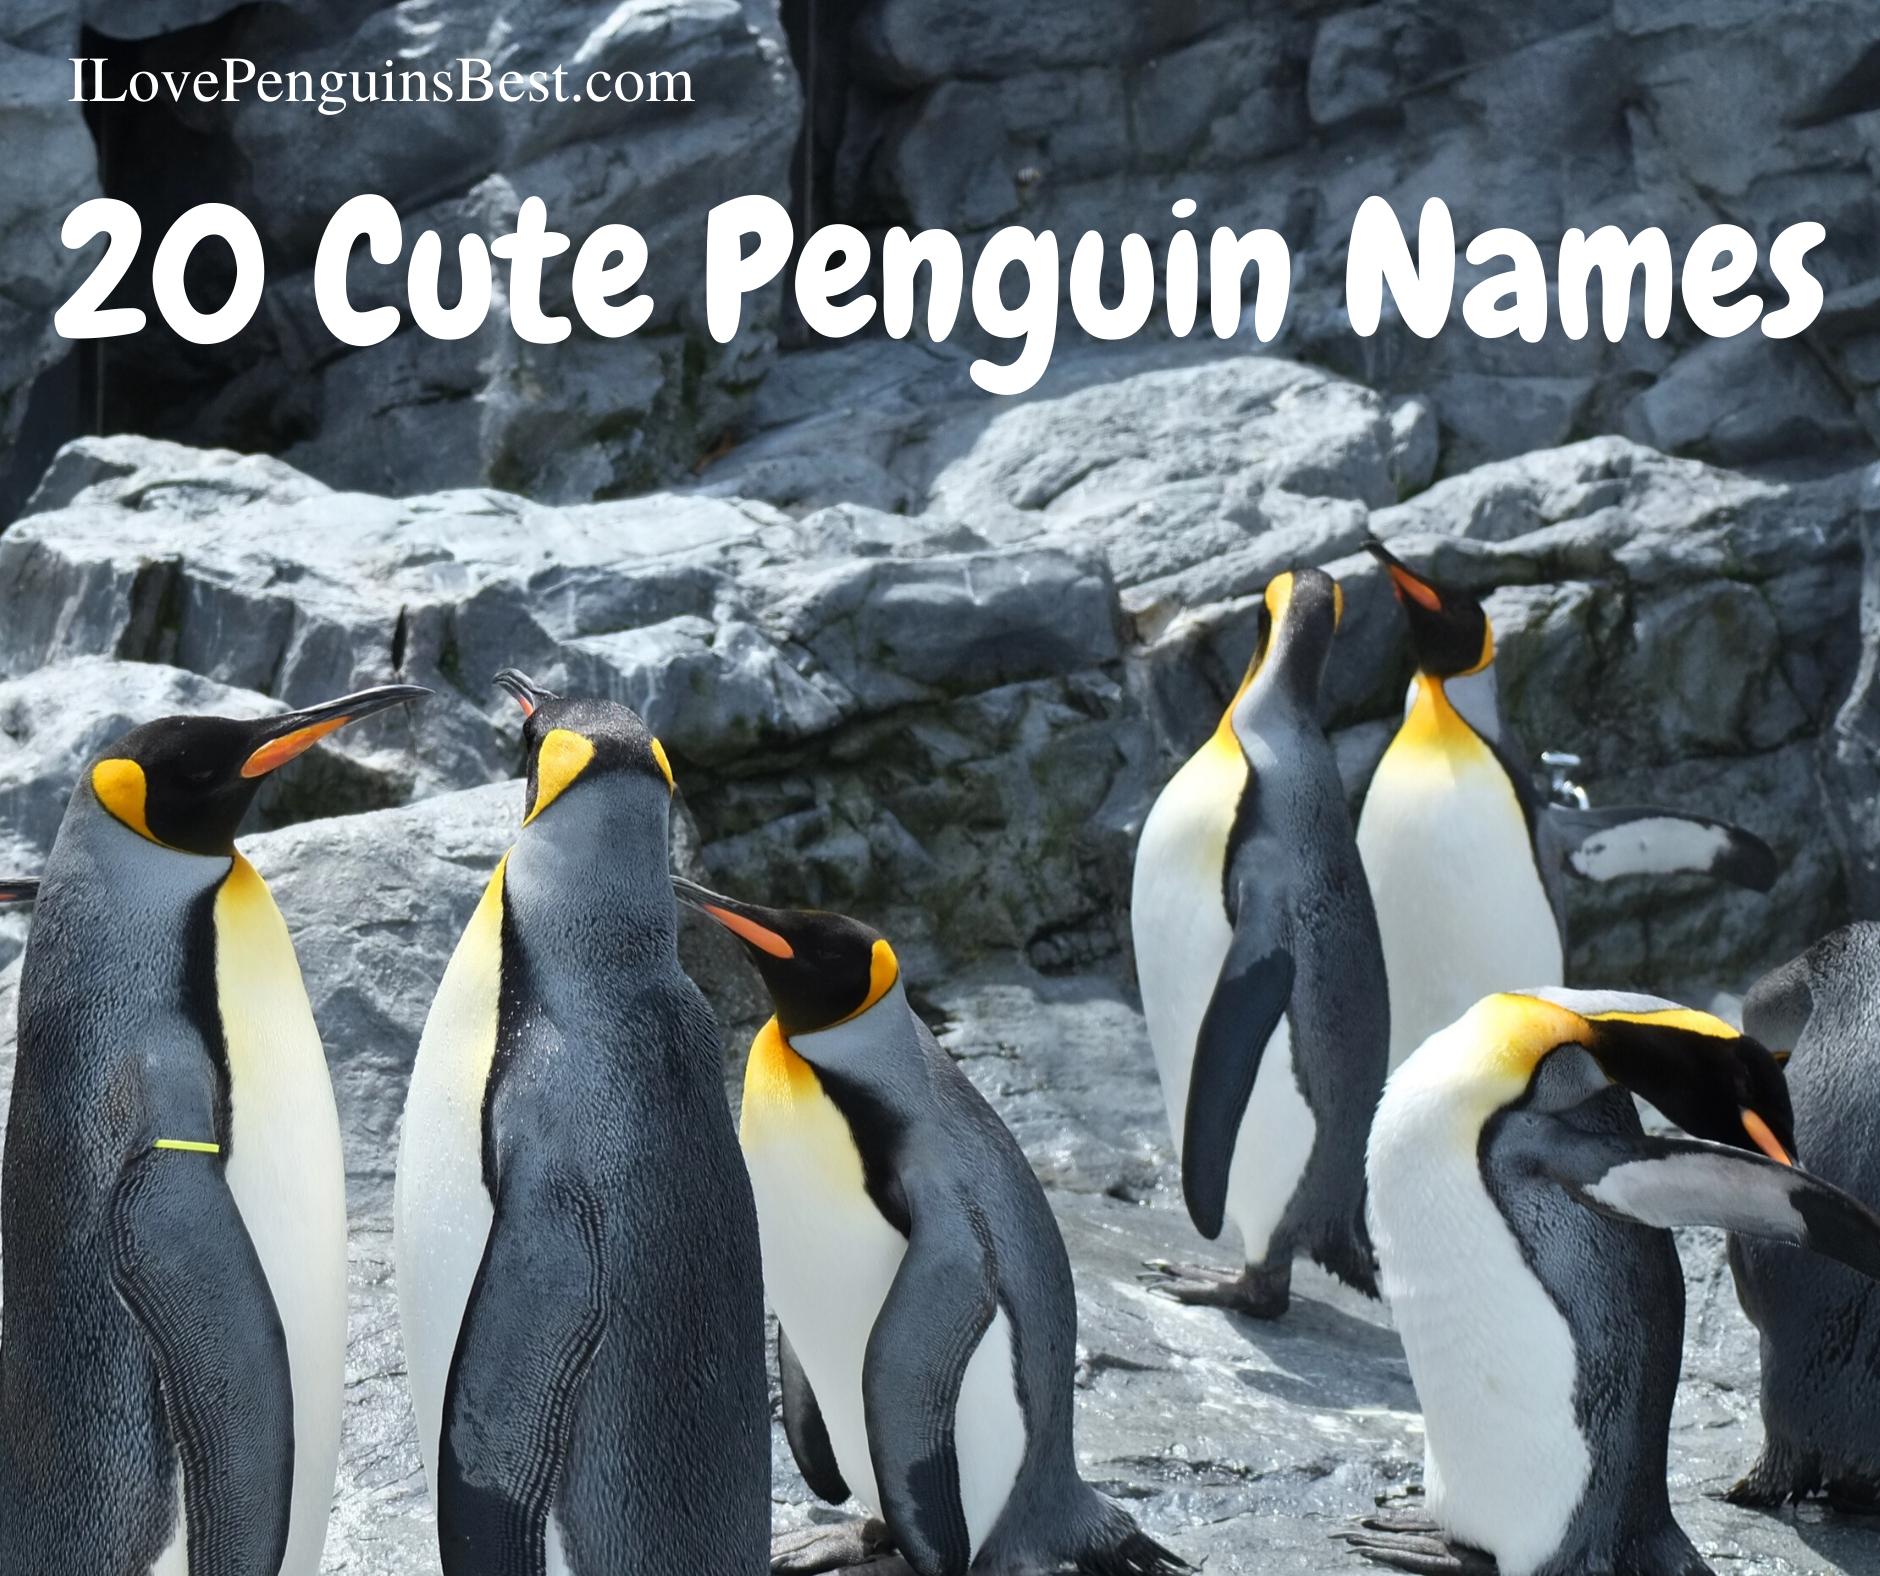 20 Cute Penguin Names